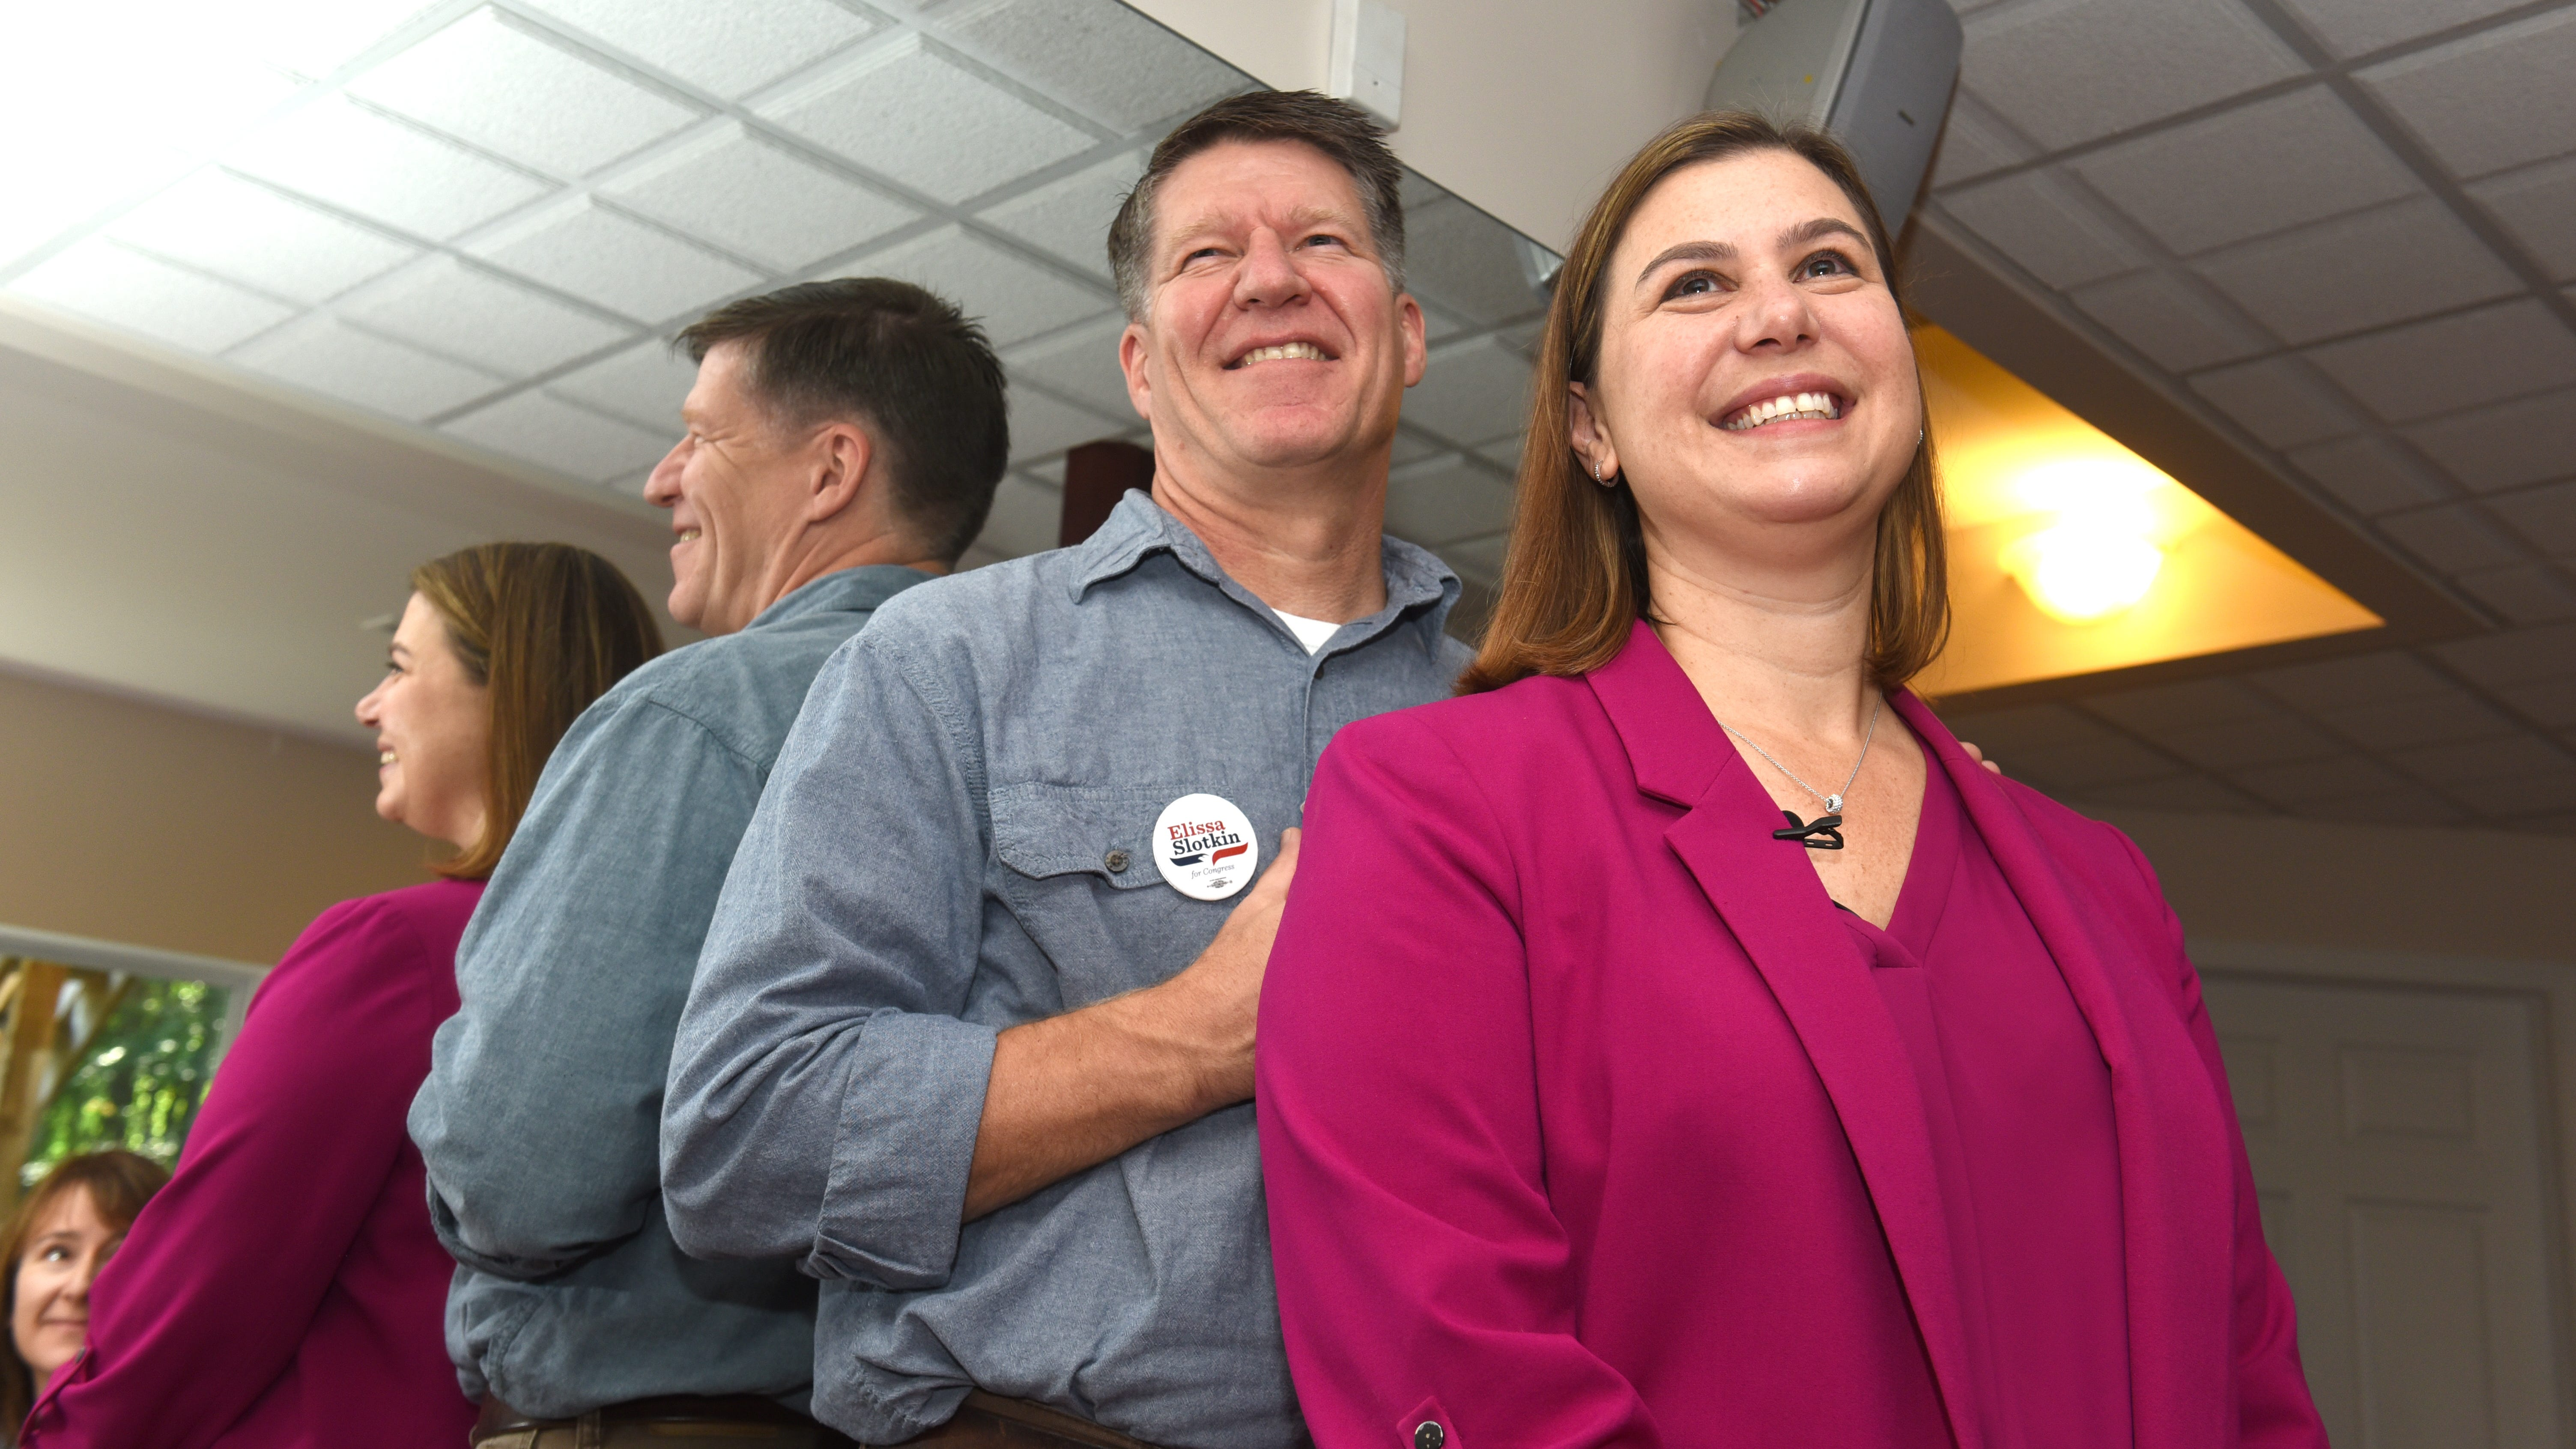 Michigan Democrats dominate in latest U.S. House fundraising